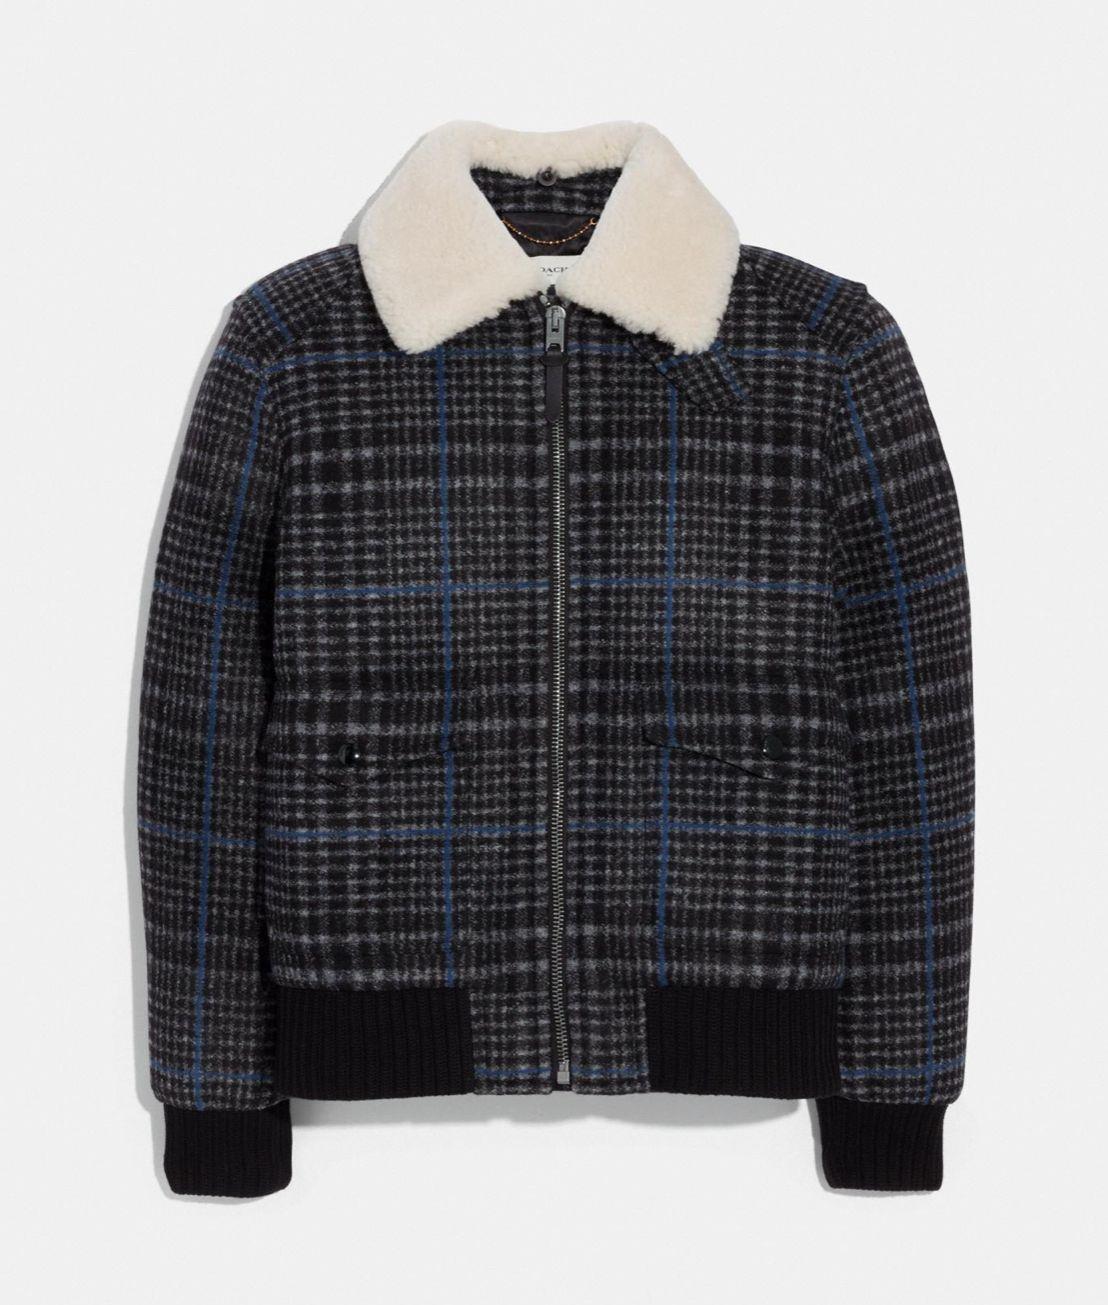 Coach Shearling Bomber Jacket Dark Grey Plaid Clothes Vintage Military Jacket Shearling Jacket [ 1305 x 1108 Pixel ]